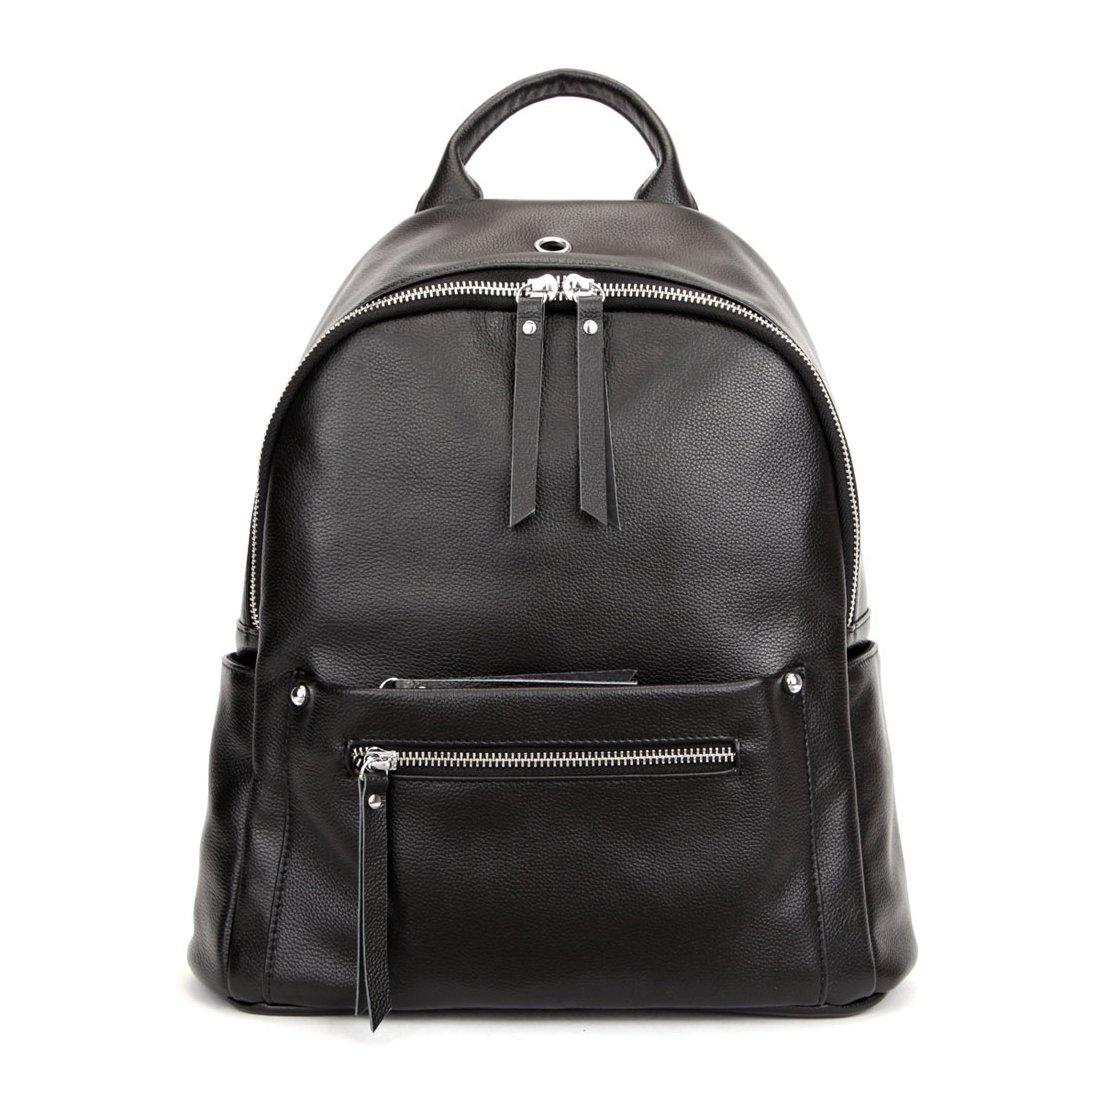 BEIERベル新しいトップレイヤーレザーバックパックトレンドファッションレディースソフトバックパックカジュアル野生実用女性バッグ(yaブラック)